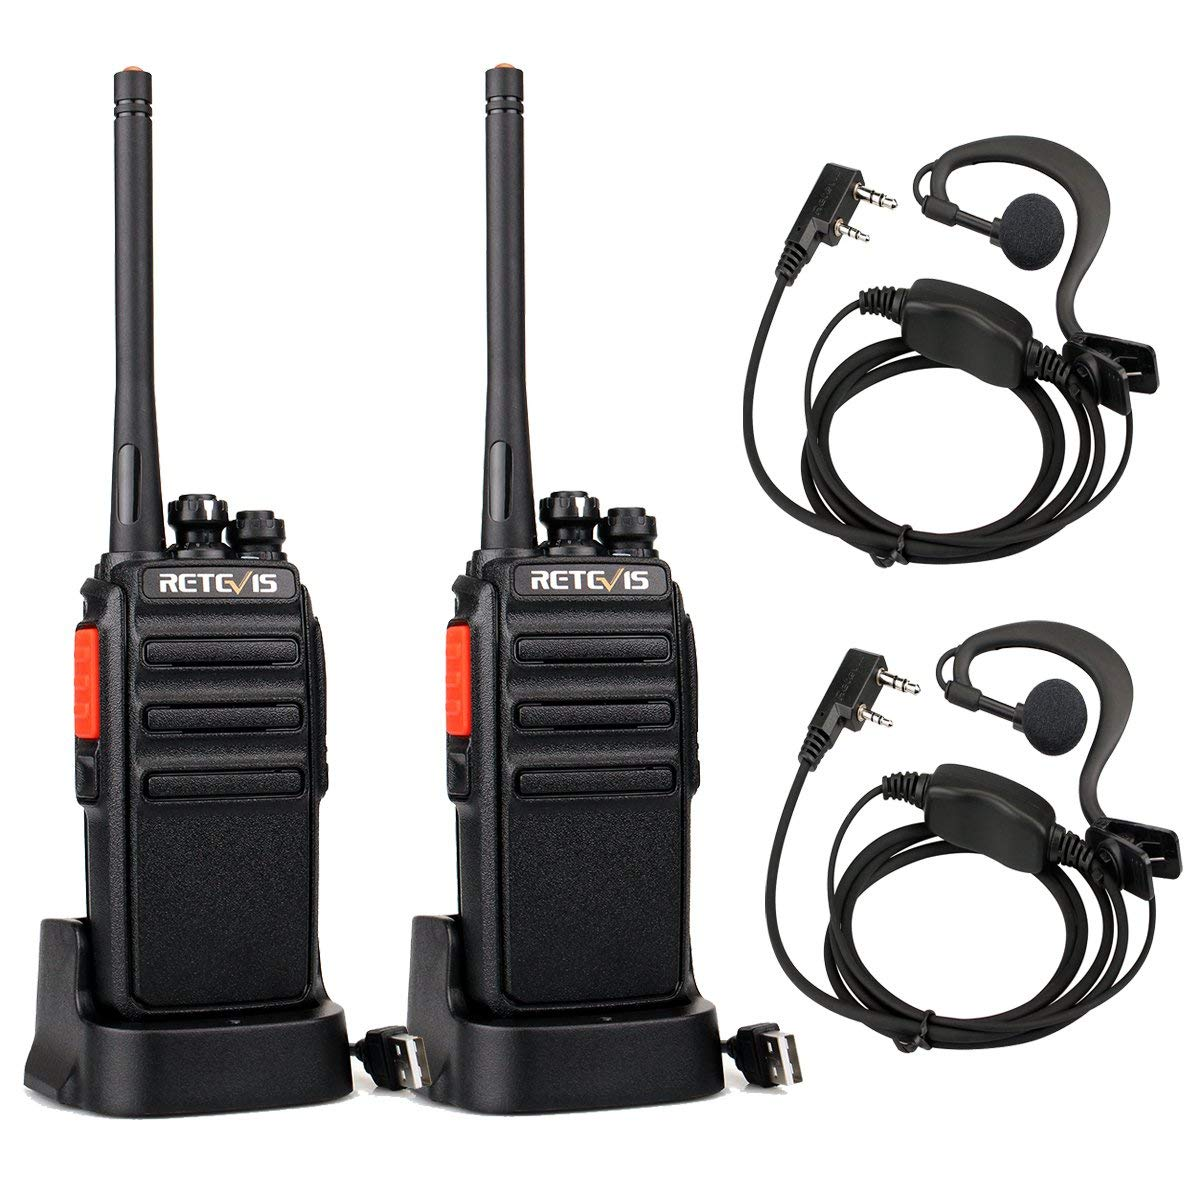 Walkie-talkie Test - Walkie-talkie mit dem Kopfhörer